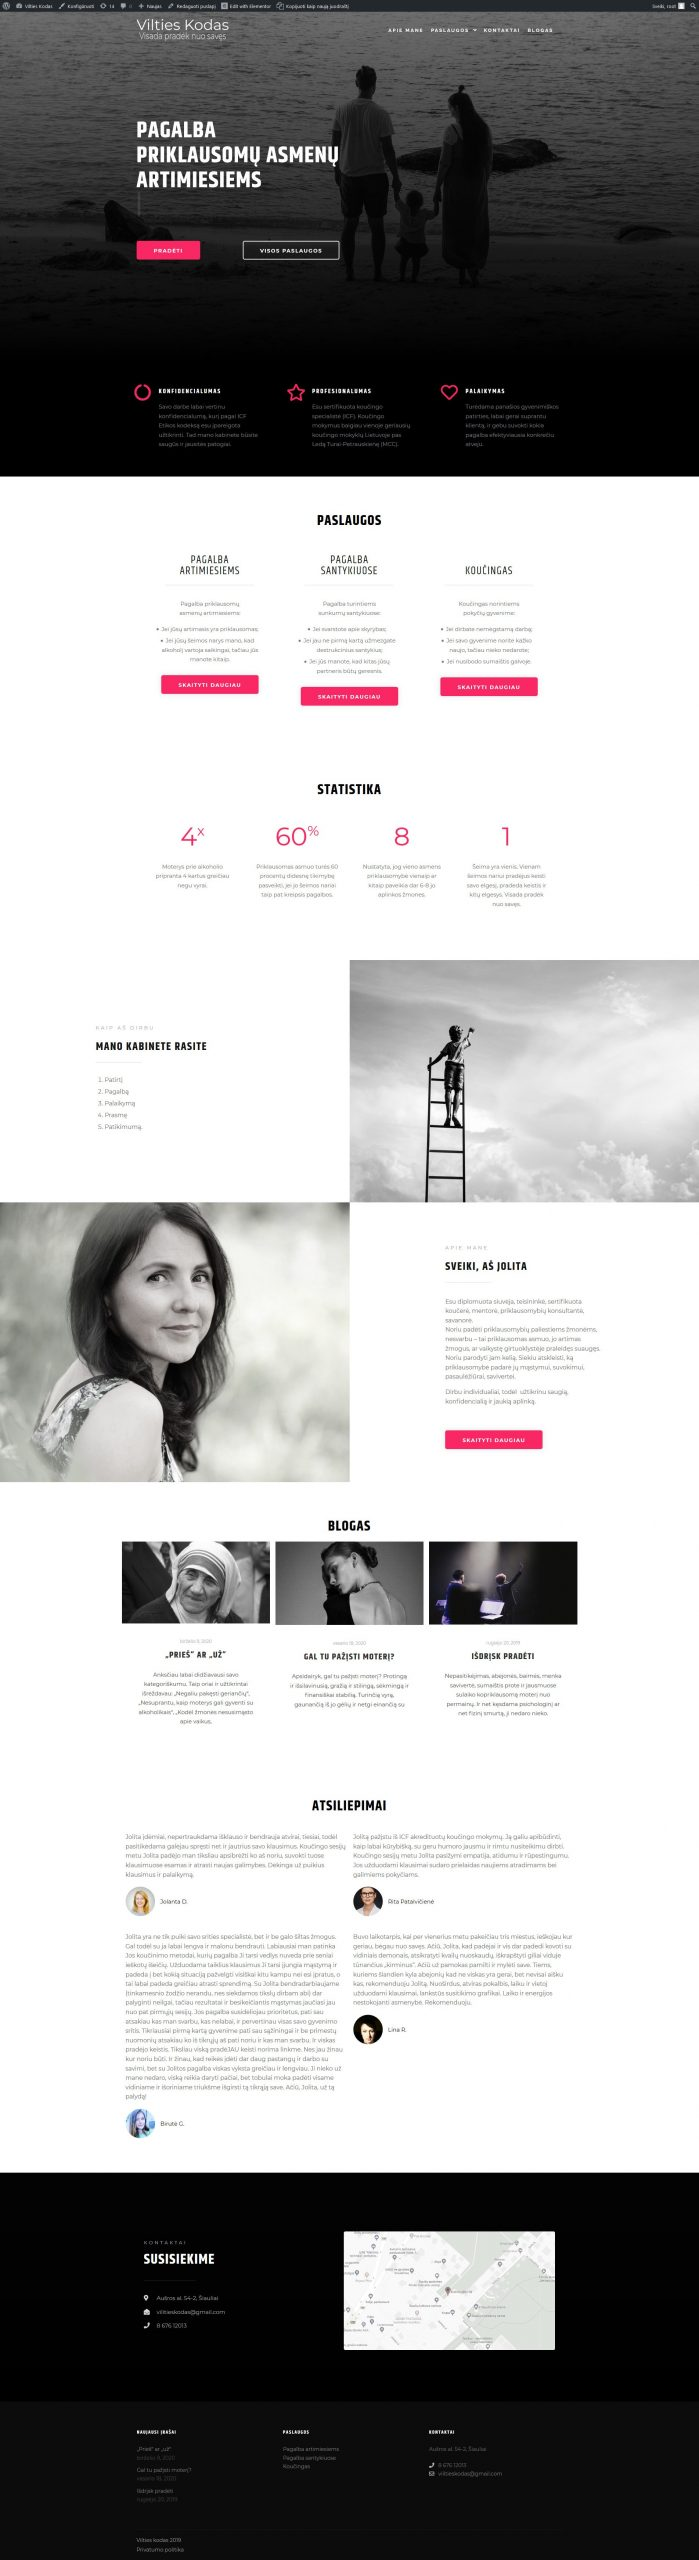 web dizainas 5